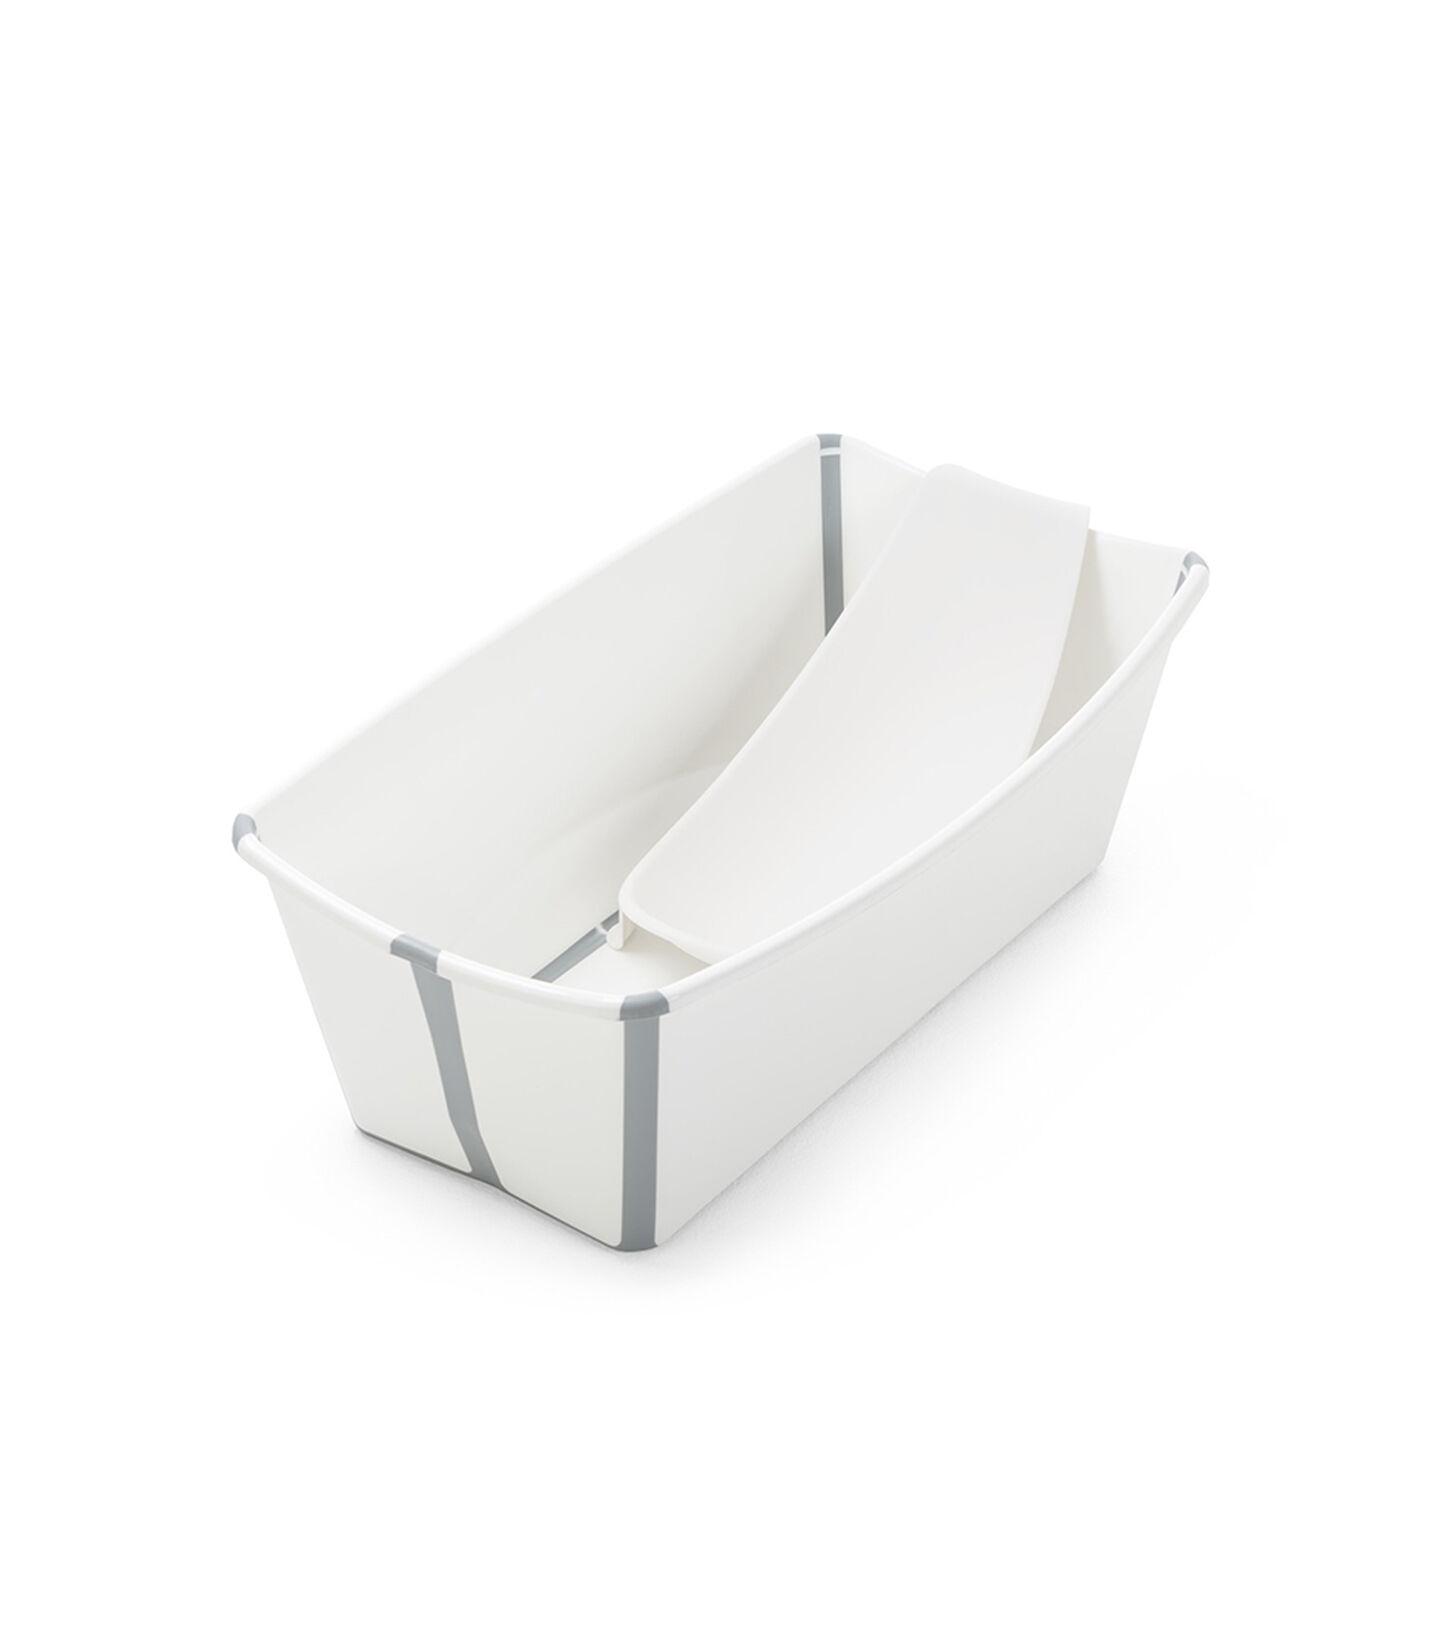 Bath tub, White. view 1